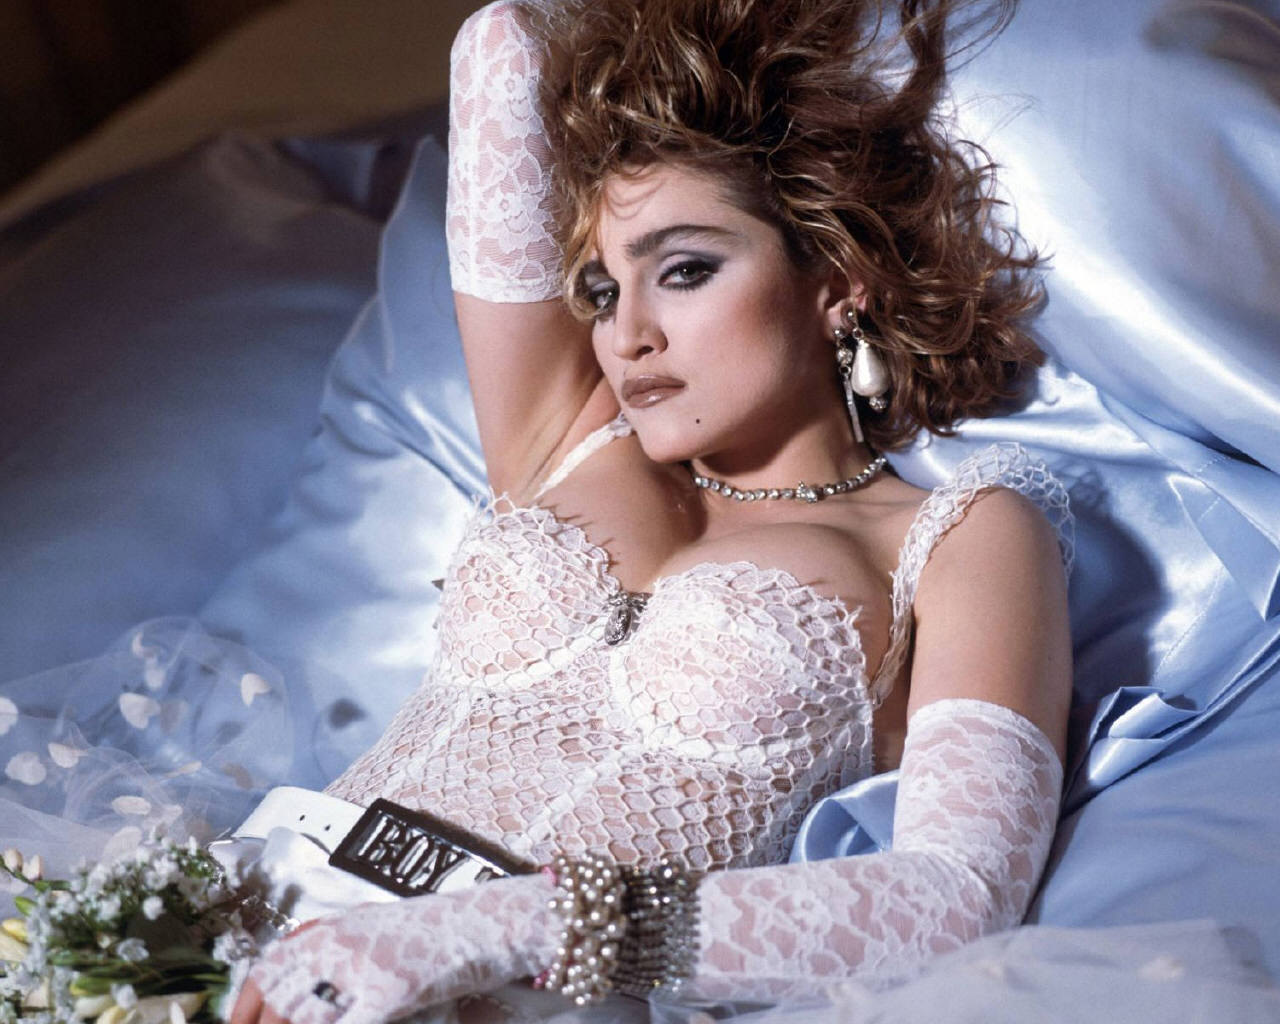 Madonna for mobile